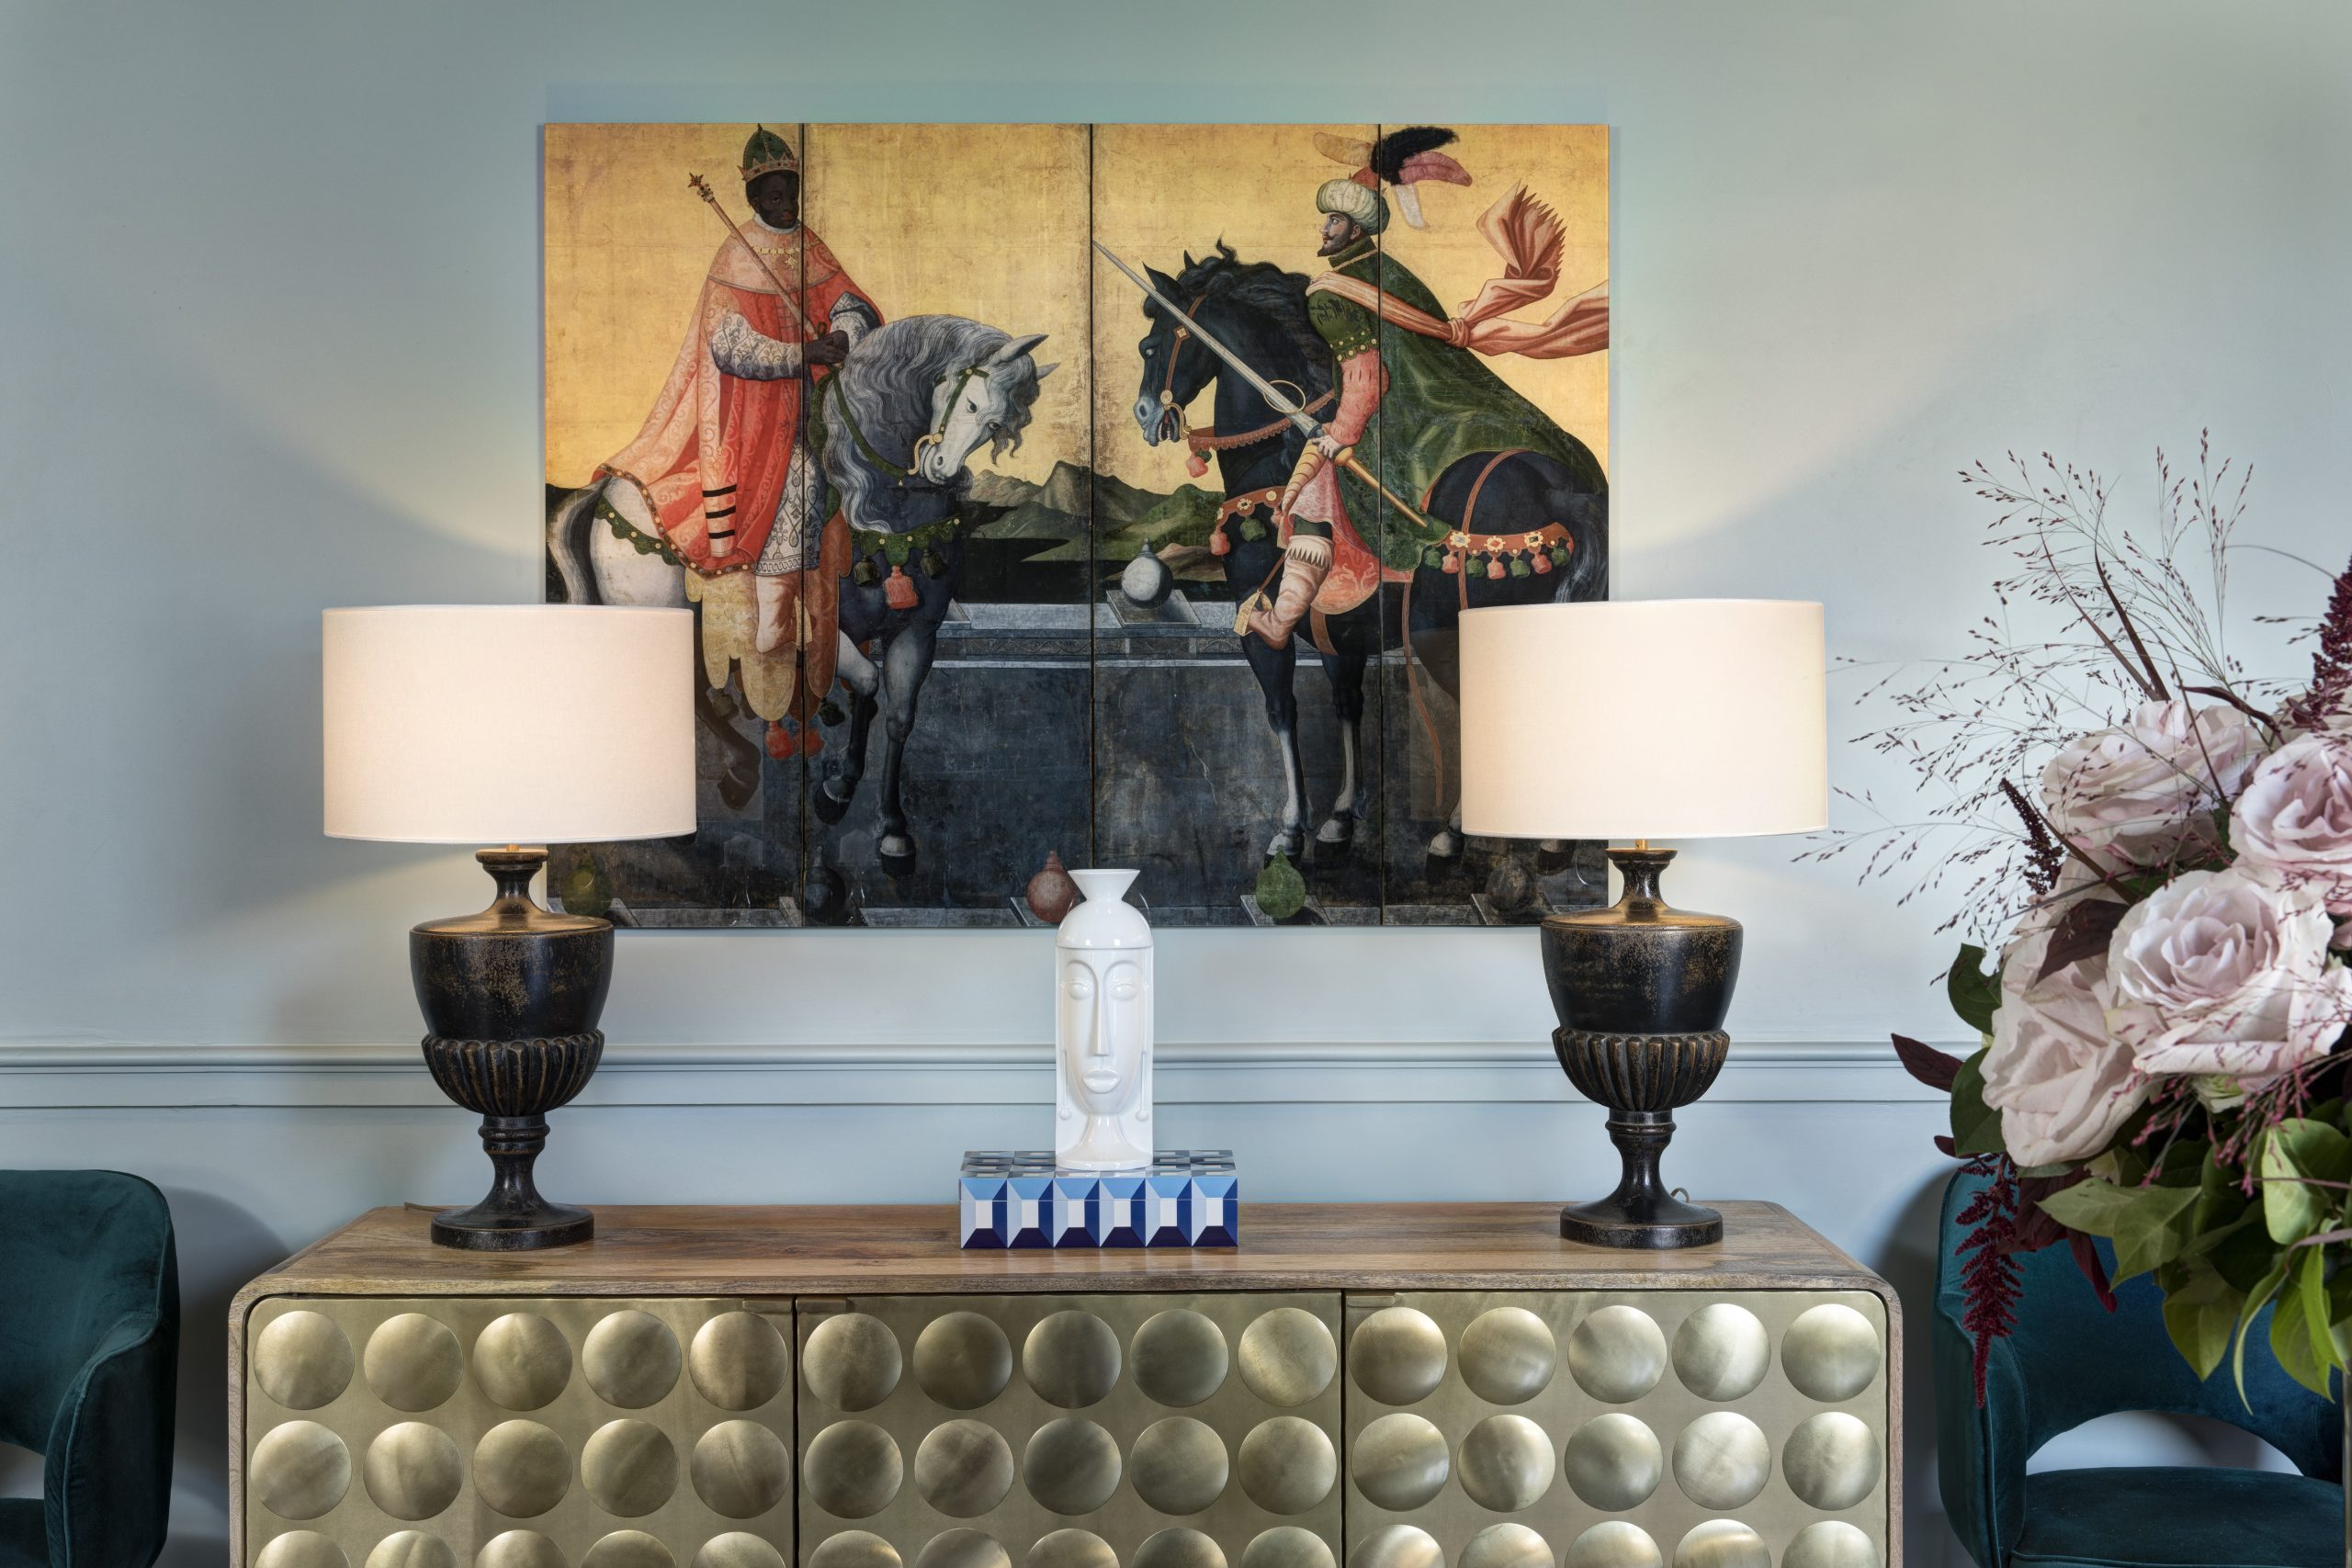 RFH Rocco Forte House - Medici Suite 9911 JG Sep 19